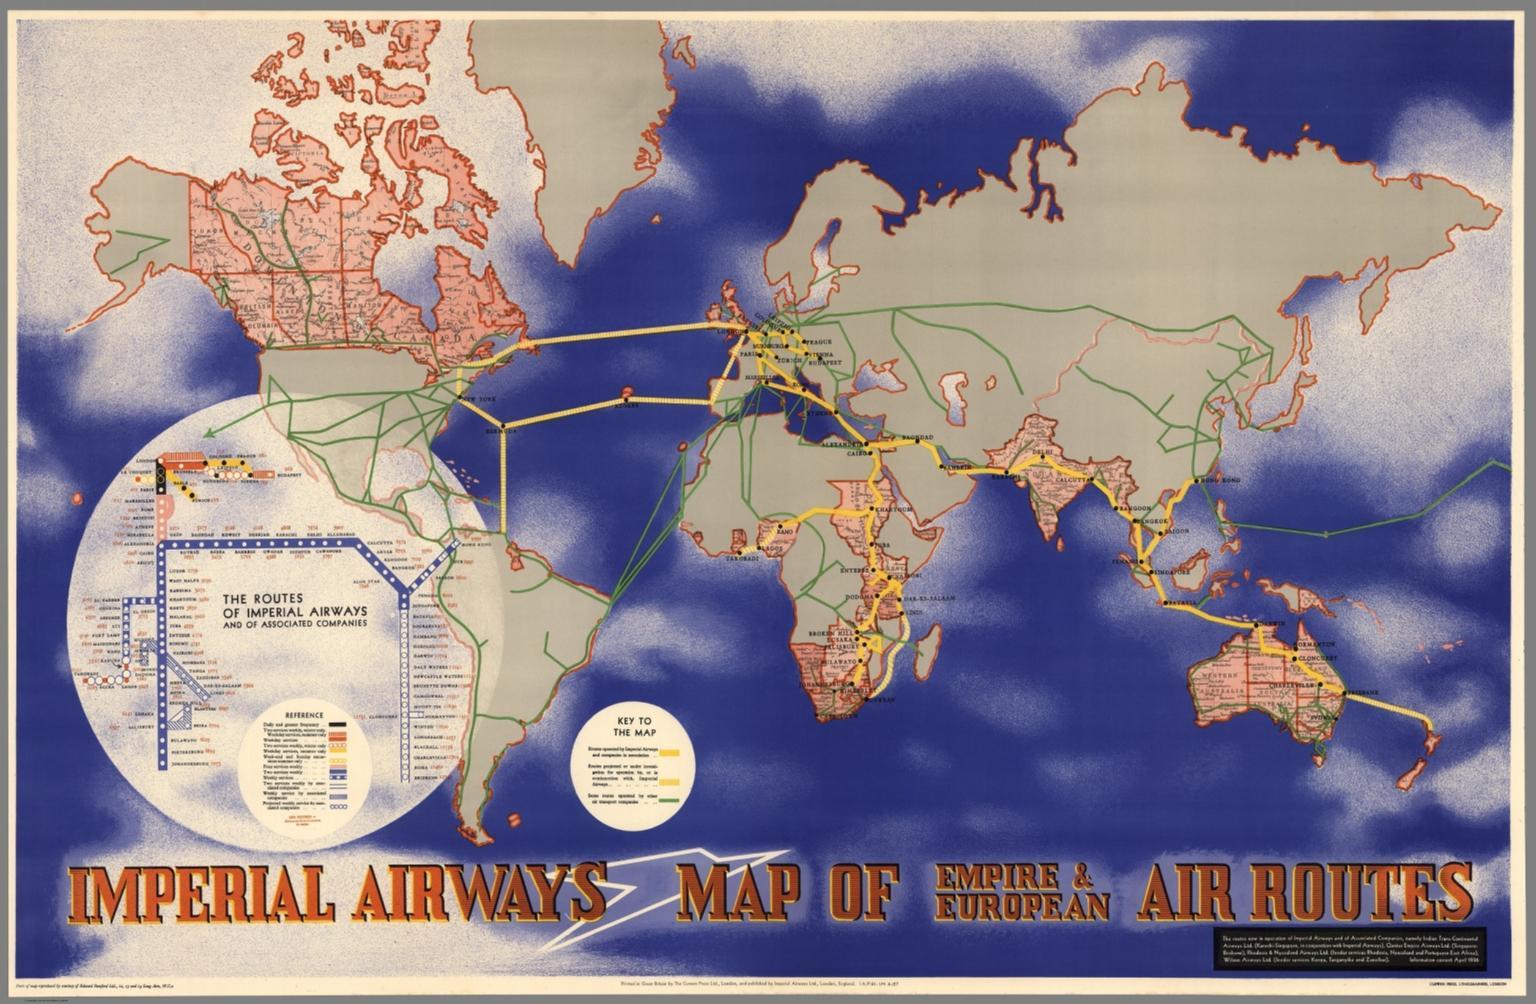 Imperial Airways Map of Empire & European Air Routes.